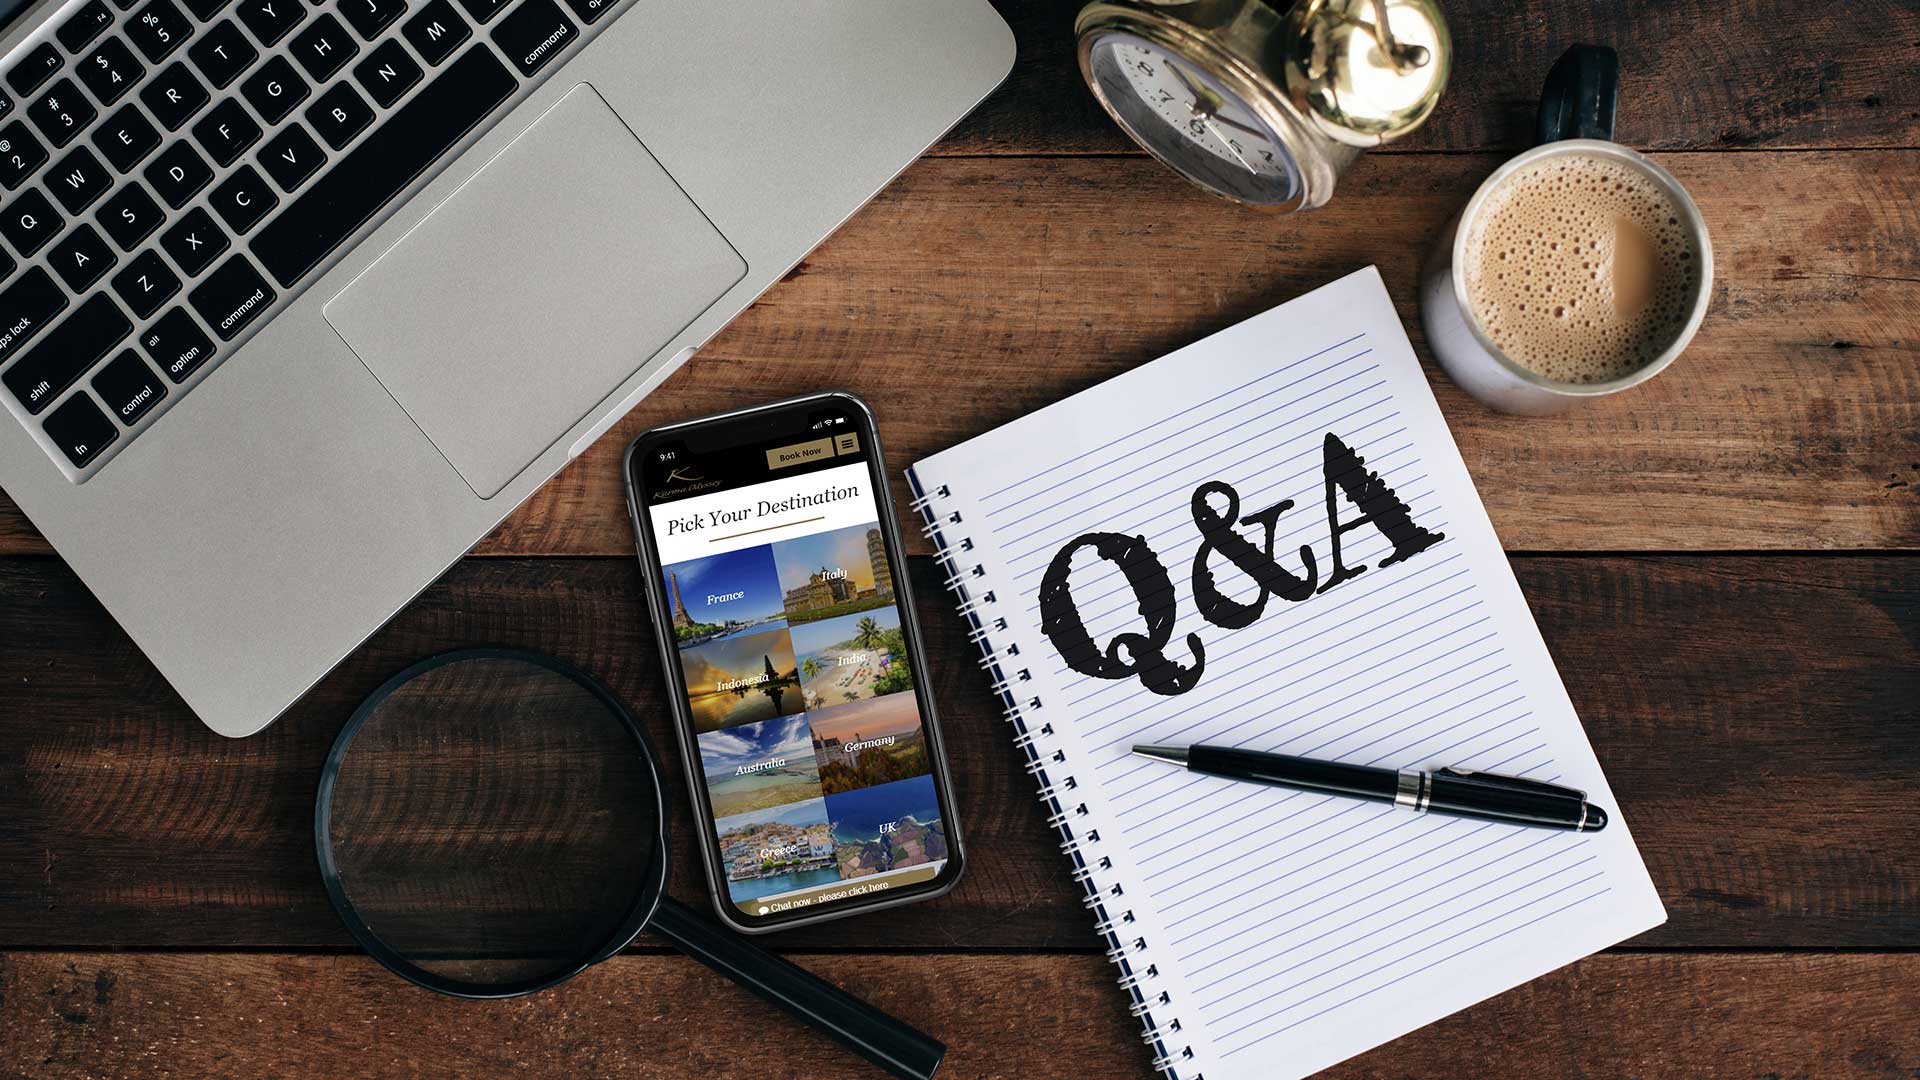 Membership Q&A Vol. 6 #WeAreInThisTogether